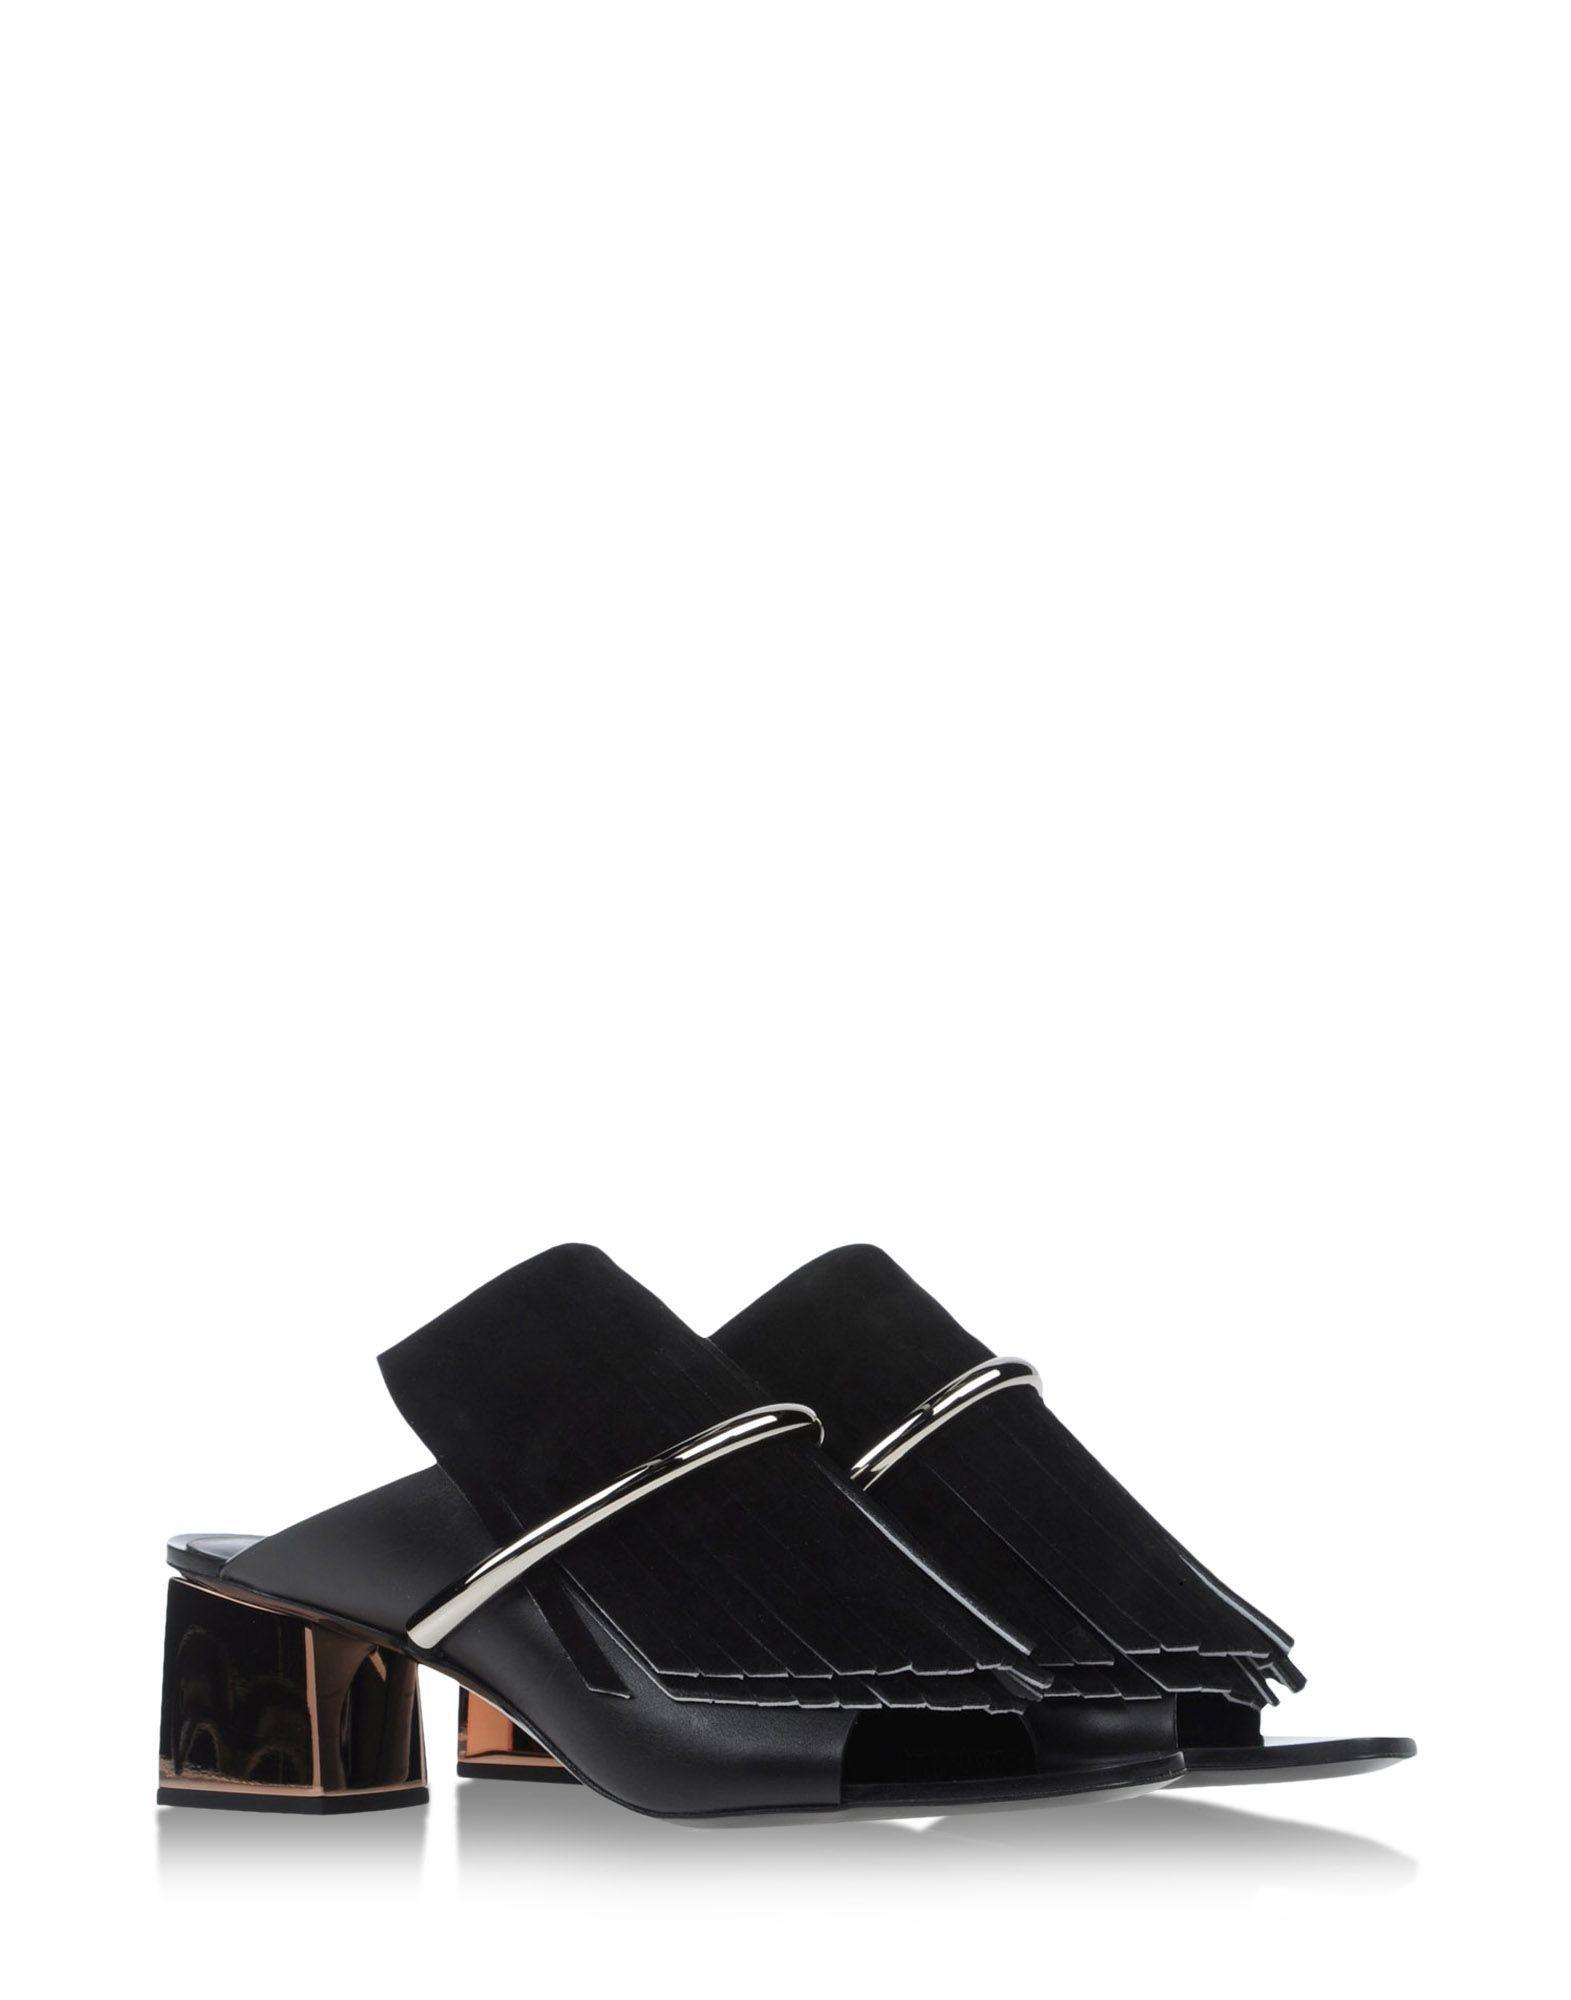 Proenza Schouler Woman Two-tone Leather Mules Off-white Size 36 Proenza Schouler 5Es7BmusOx